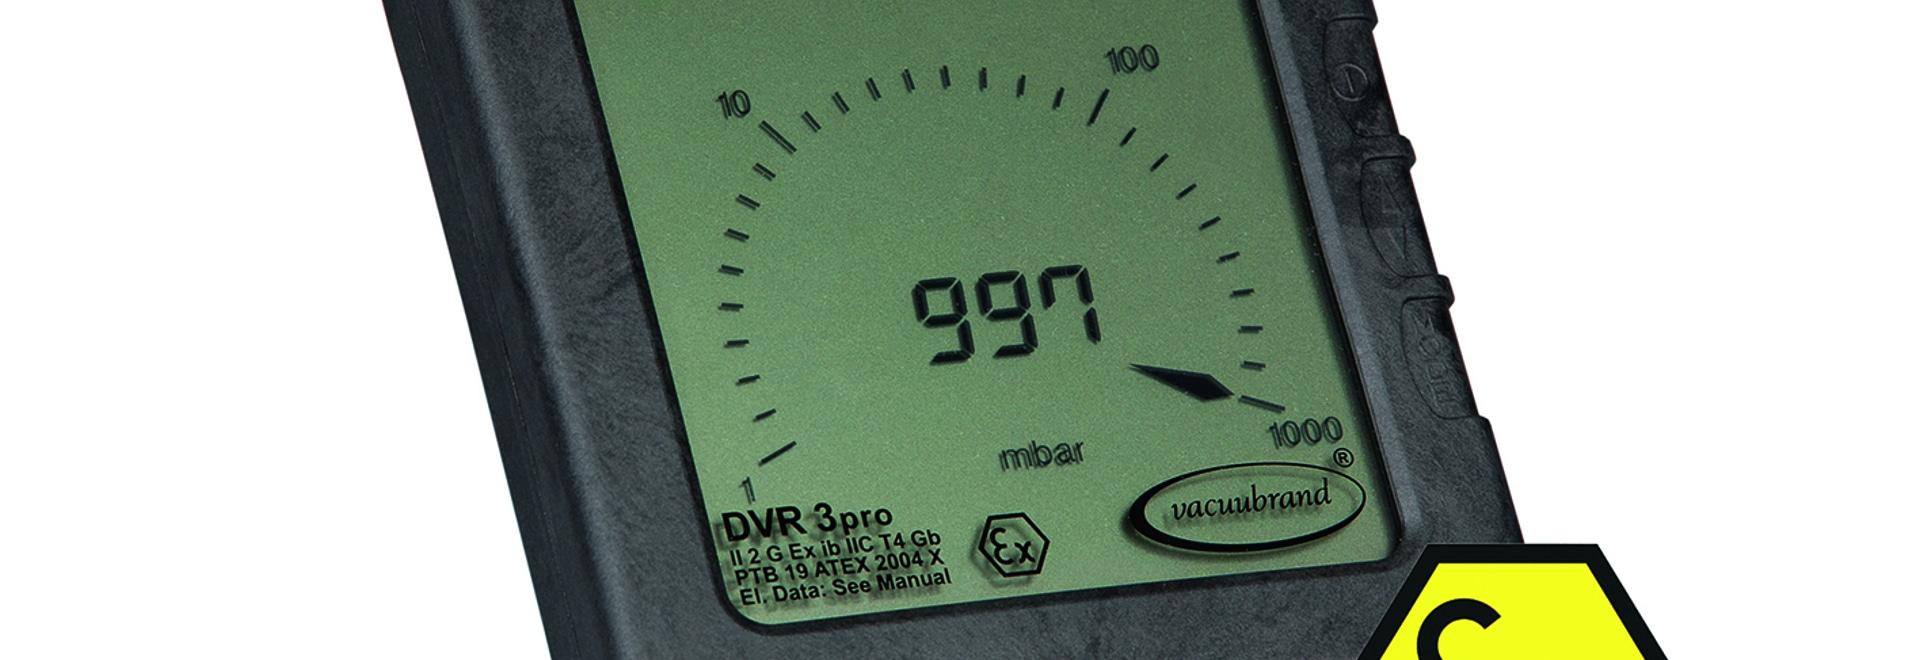 ATEX-compliant measuring device DVR 3pro